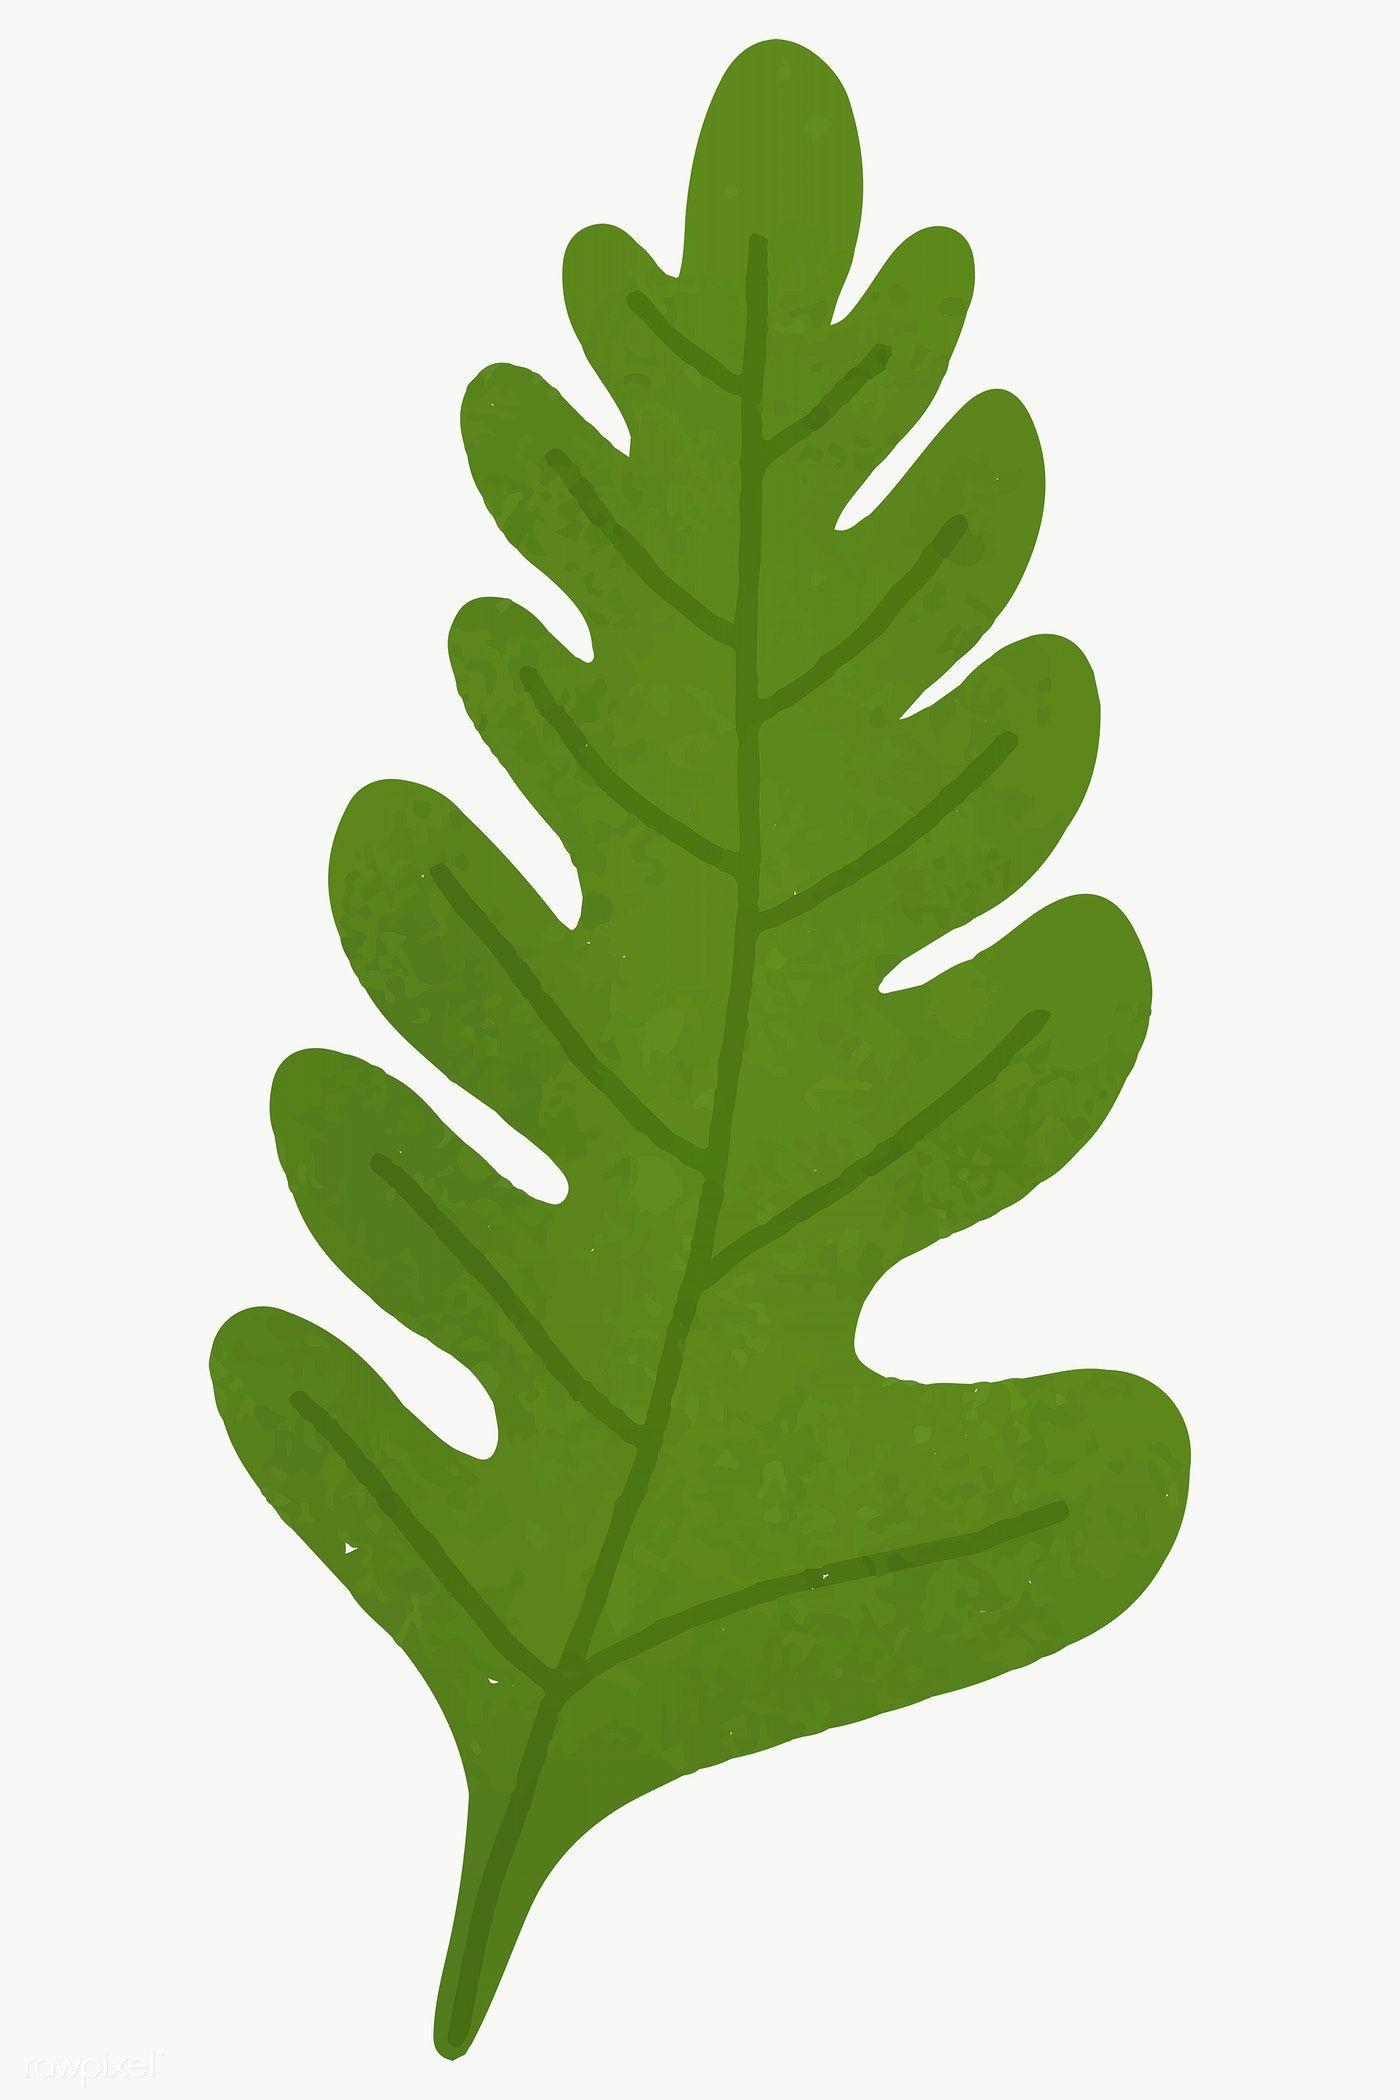 Green Oak Leaf Design Element Transparent Png Free Image By Rawpixel Com Aum